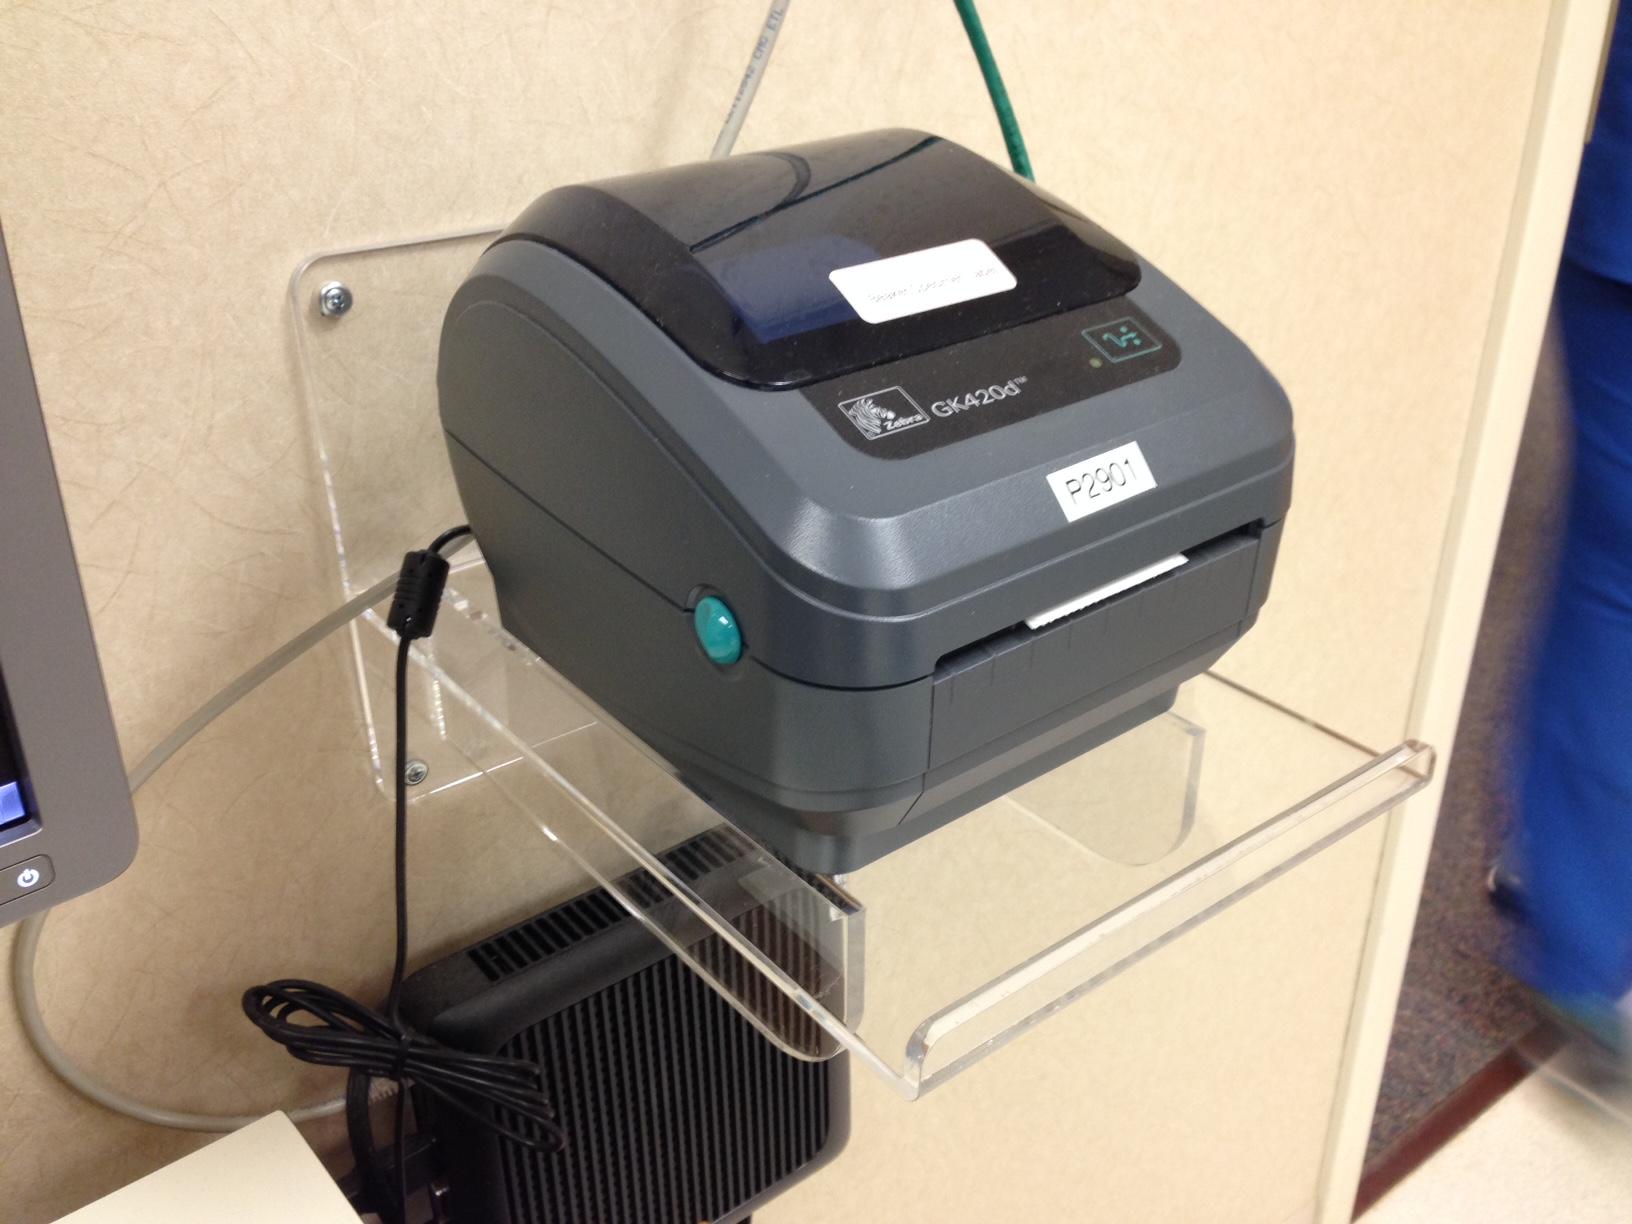 Printer Shelves